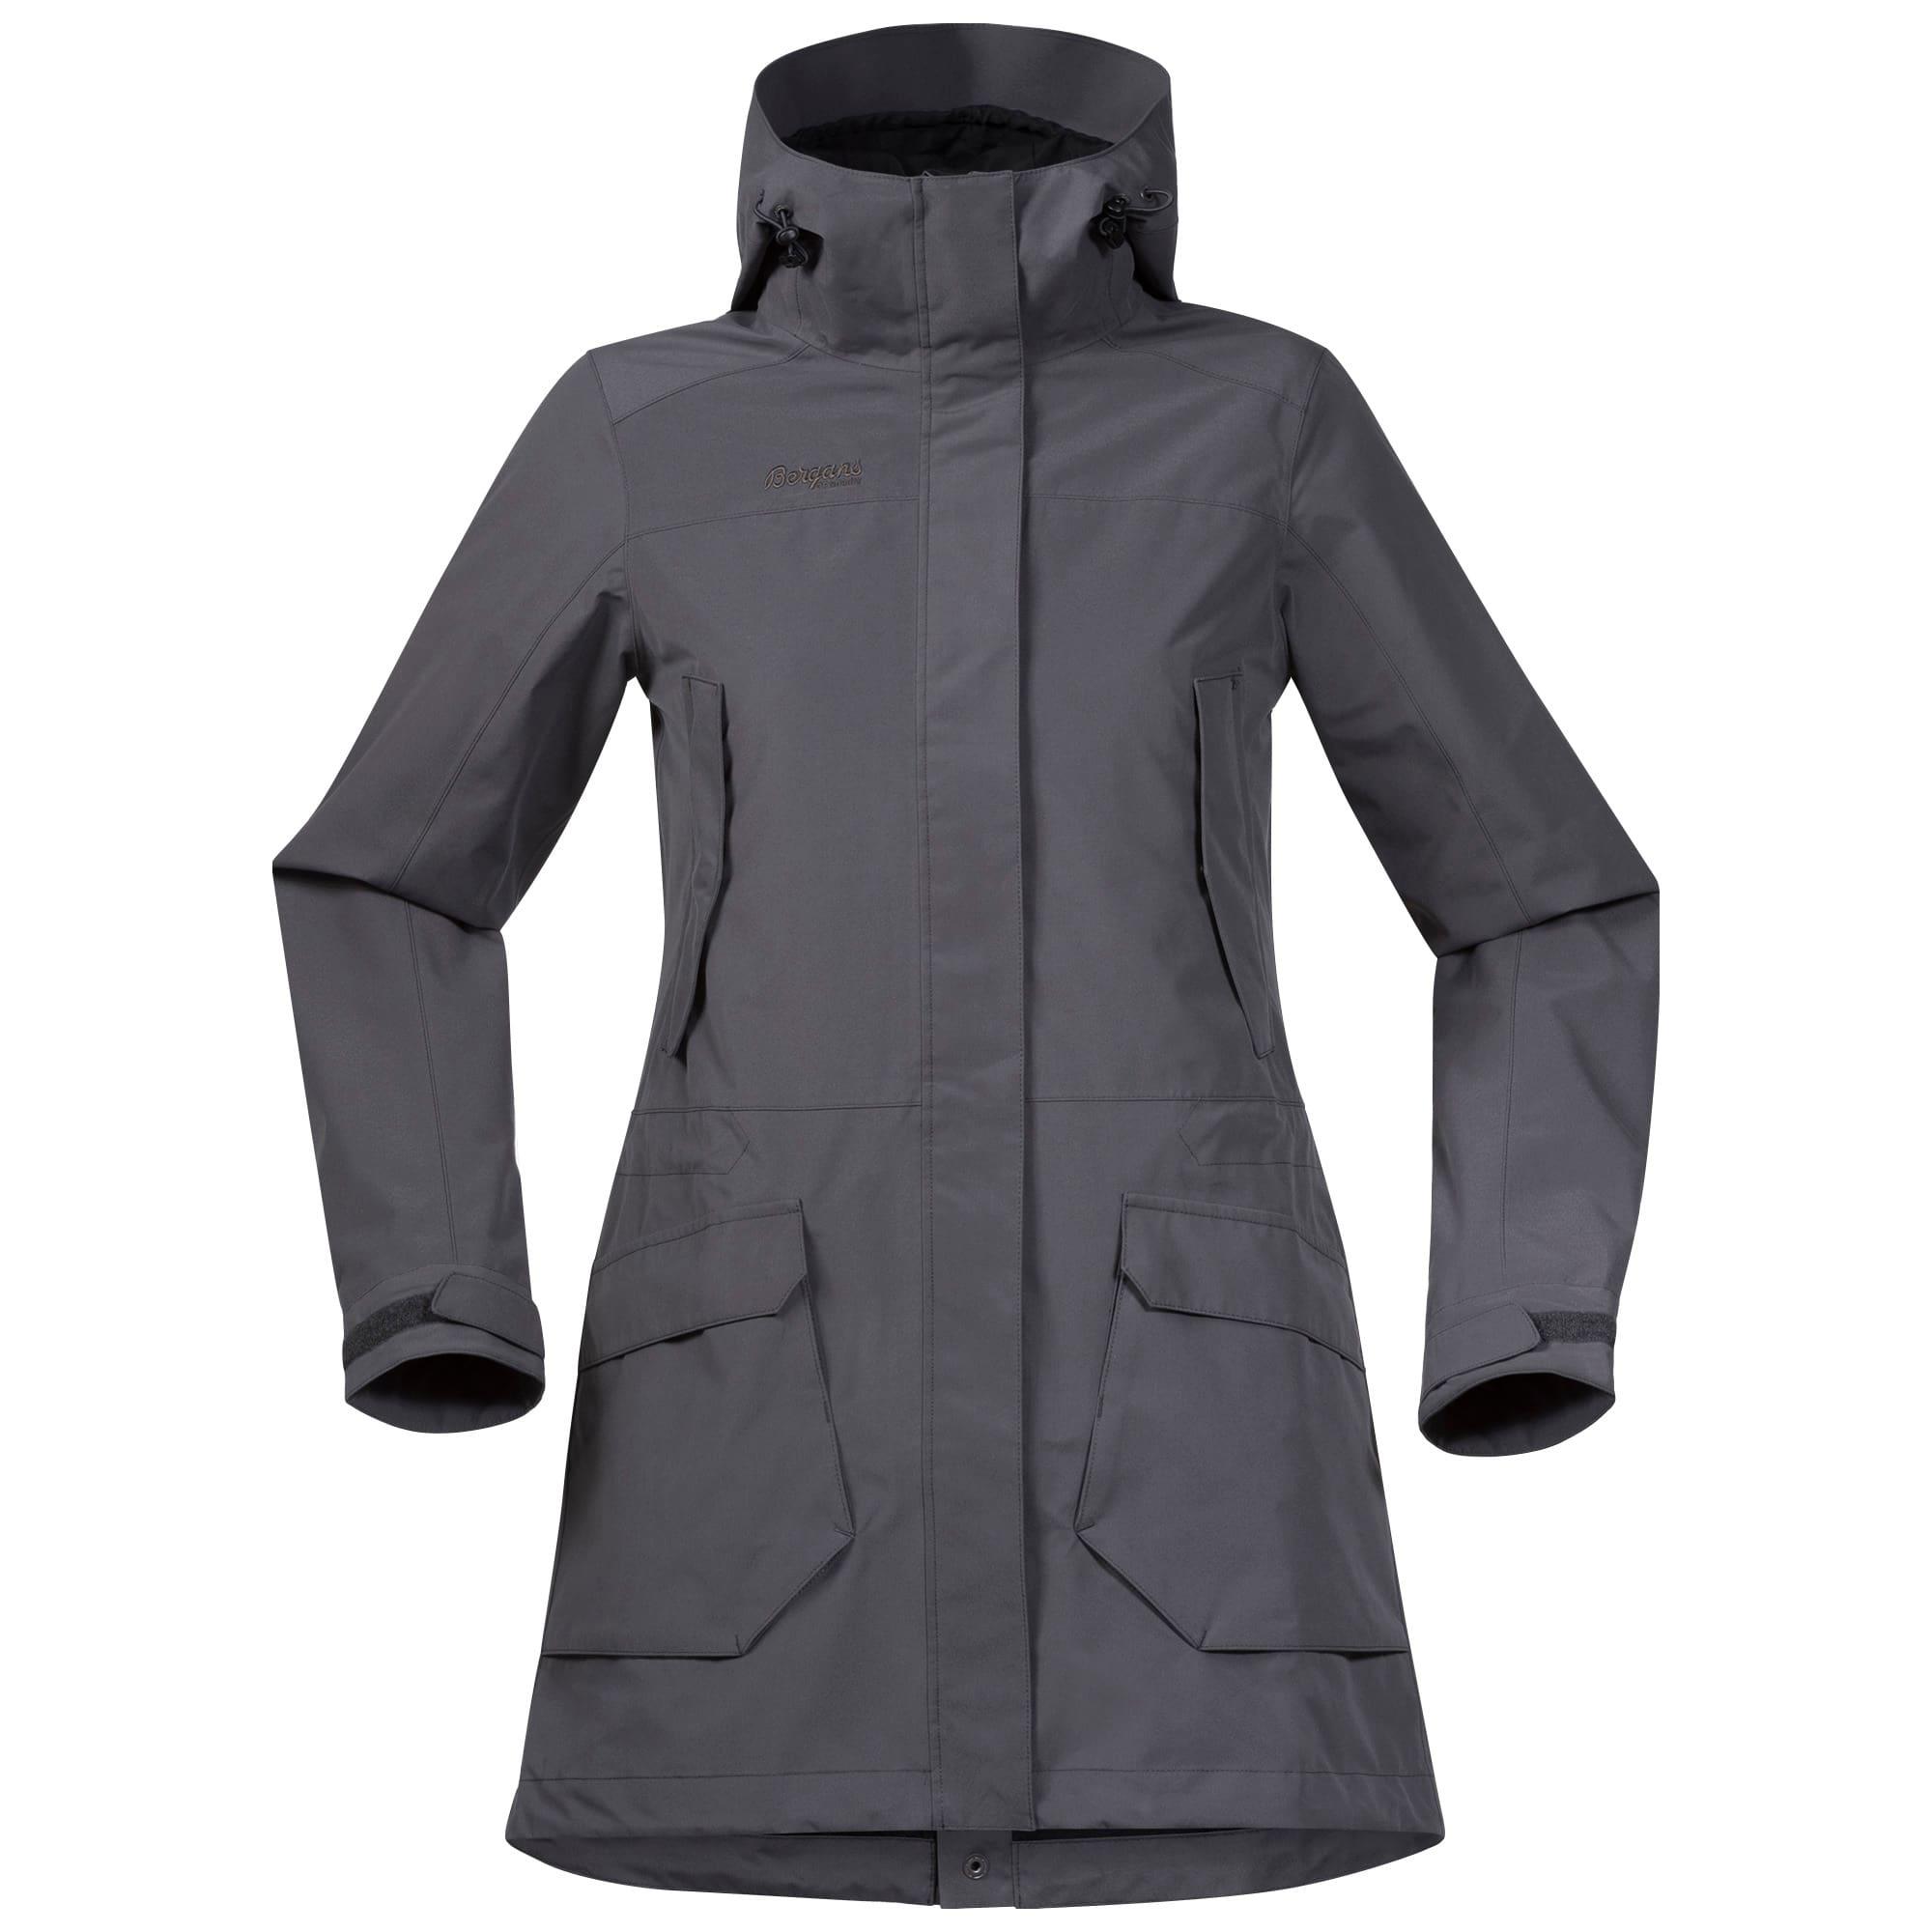 Kjøp Bergans Lone Lady Jacket fra Outnorth